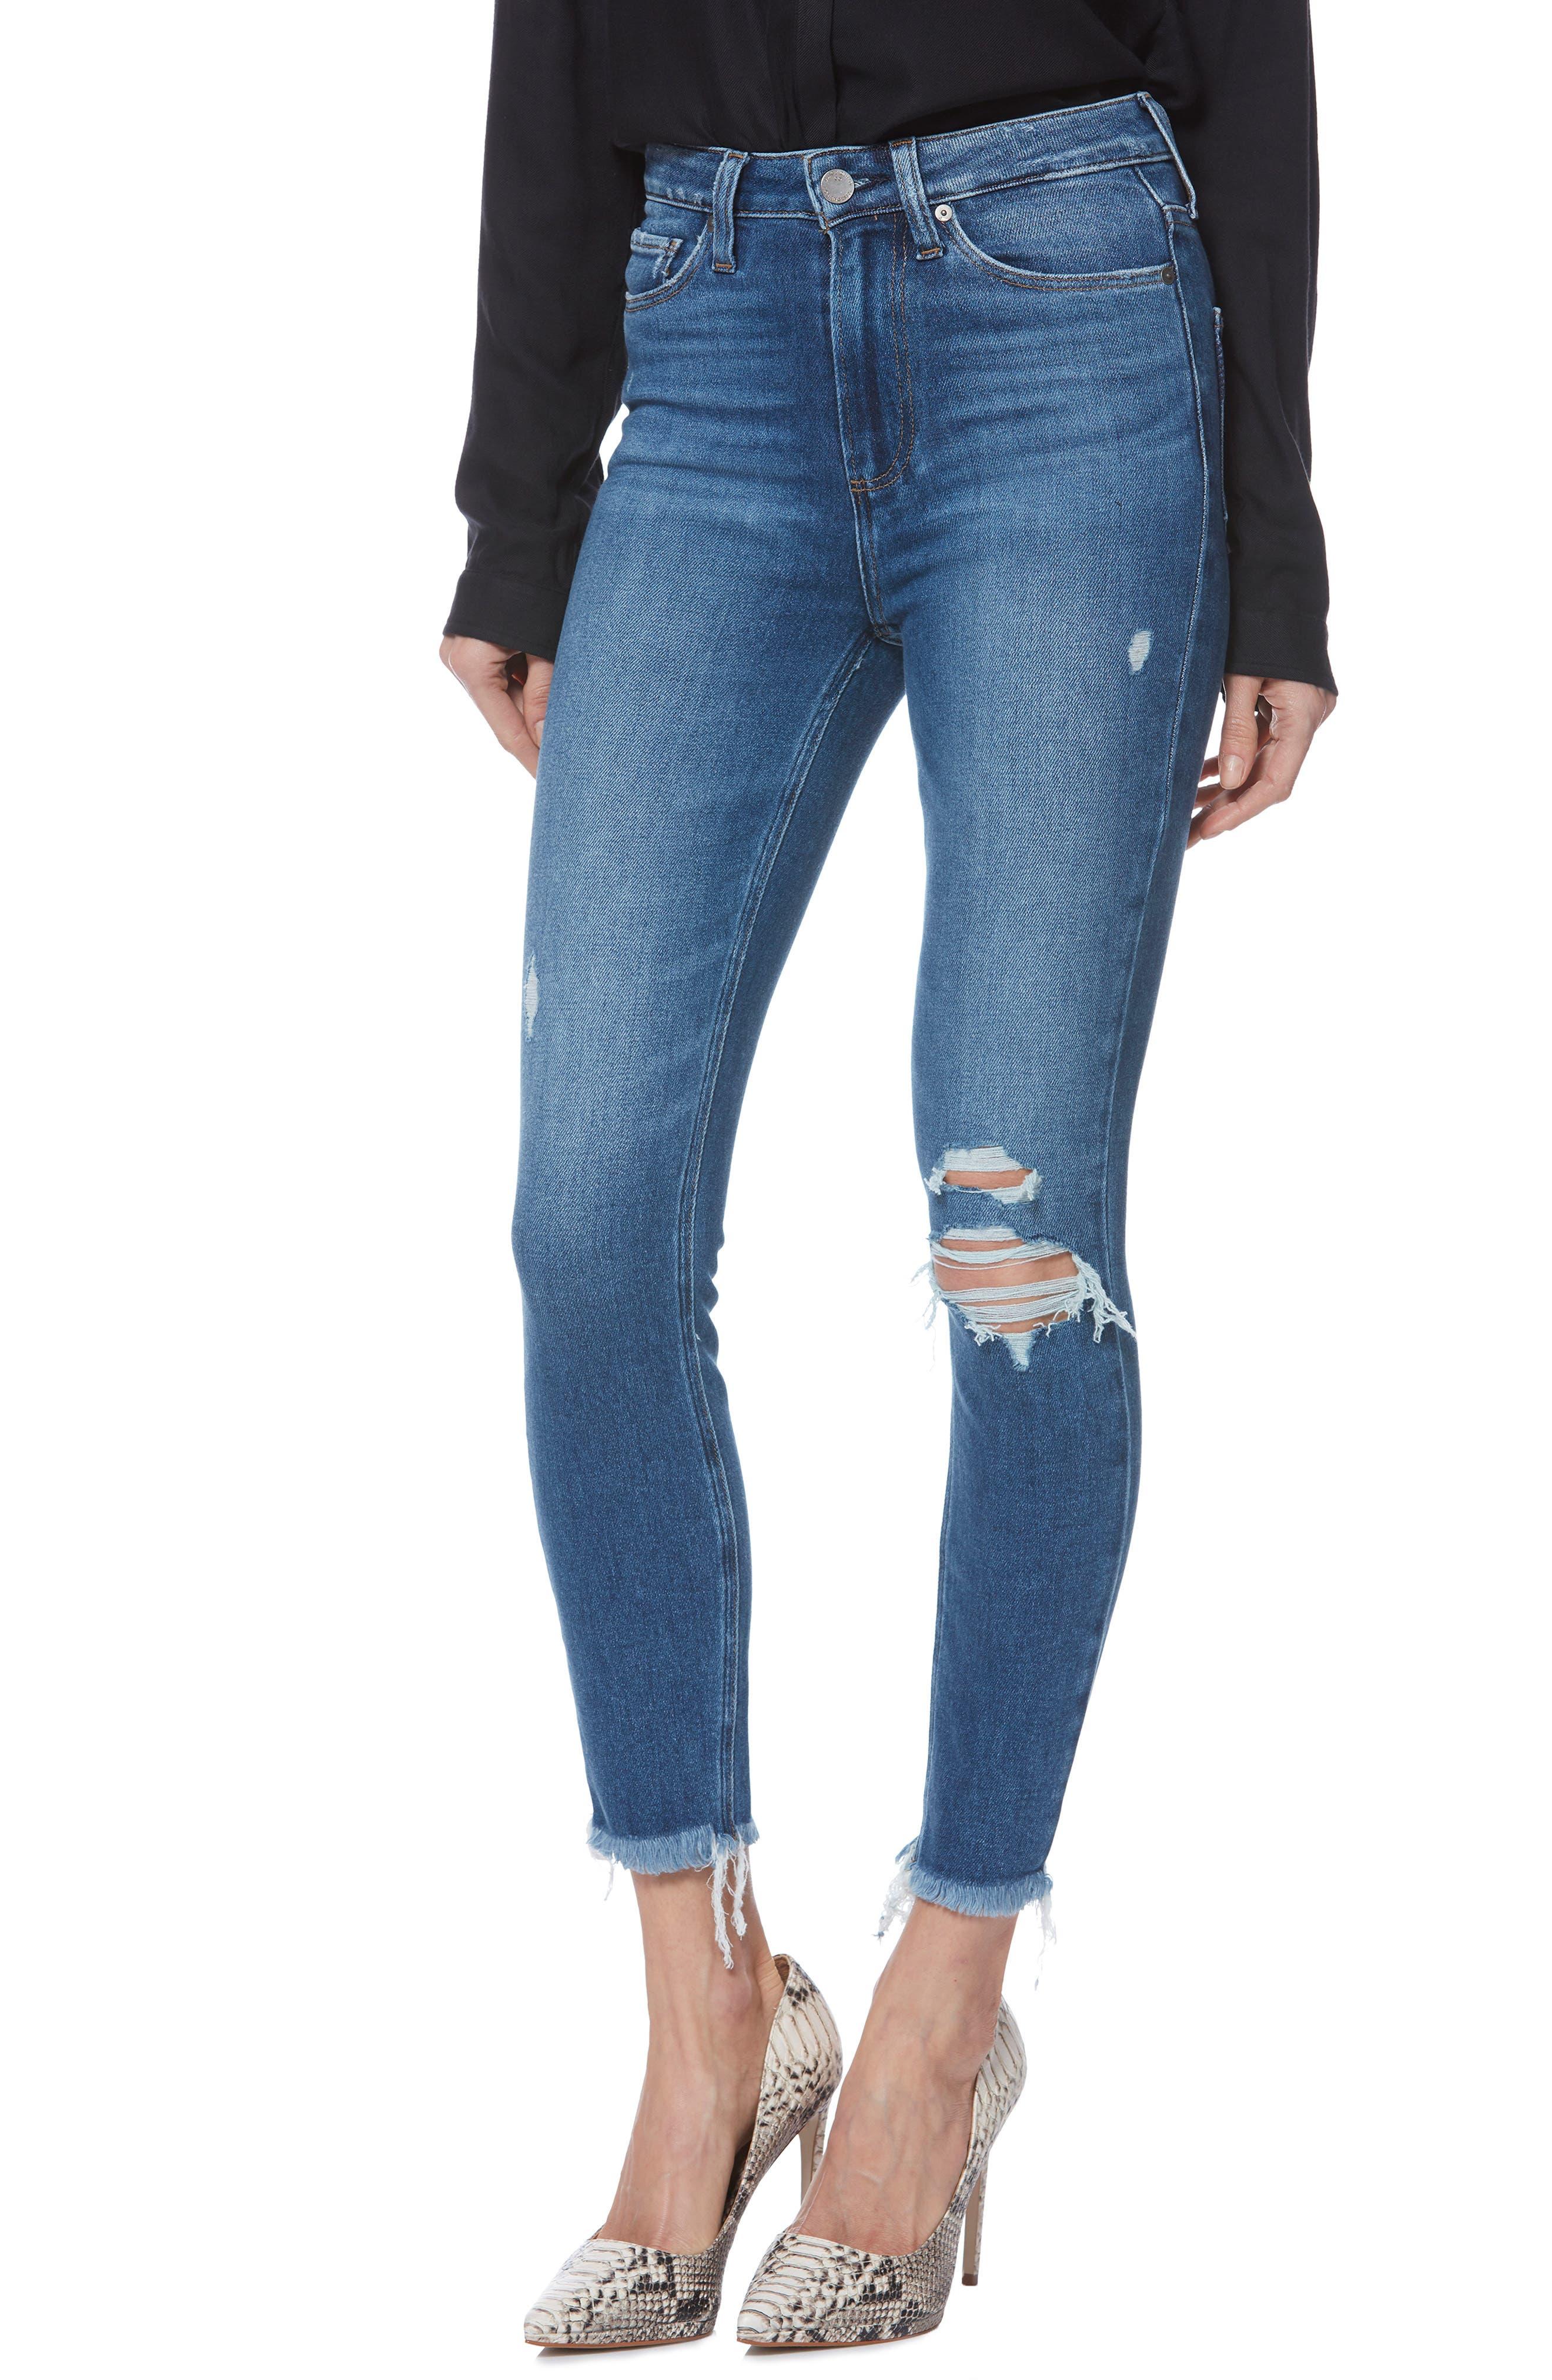 PAIGE Womens Margot Crop with Raw Hem Jeans